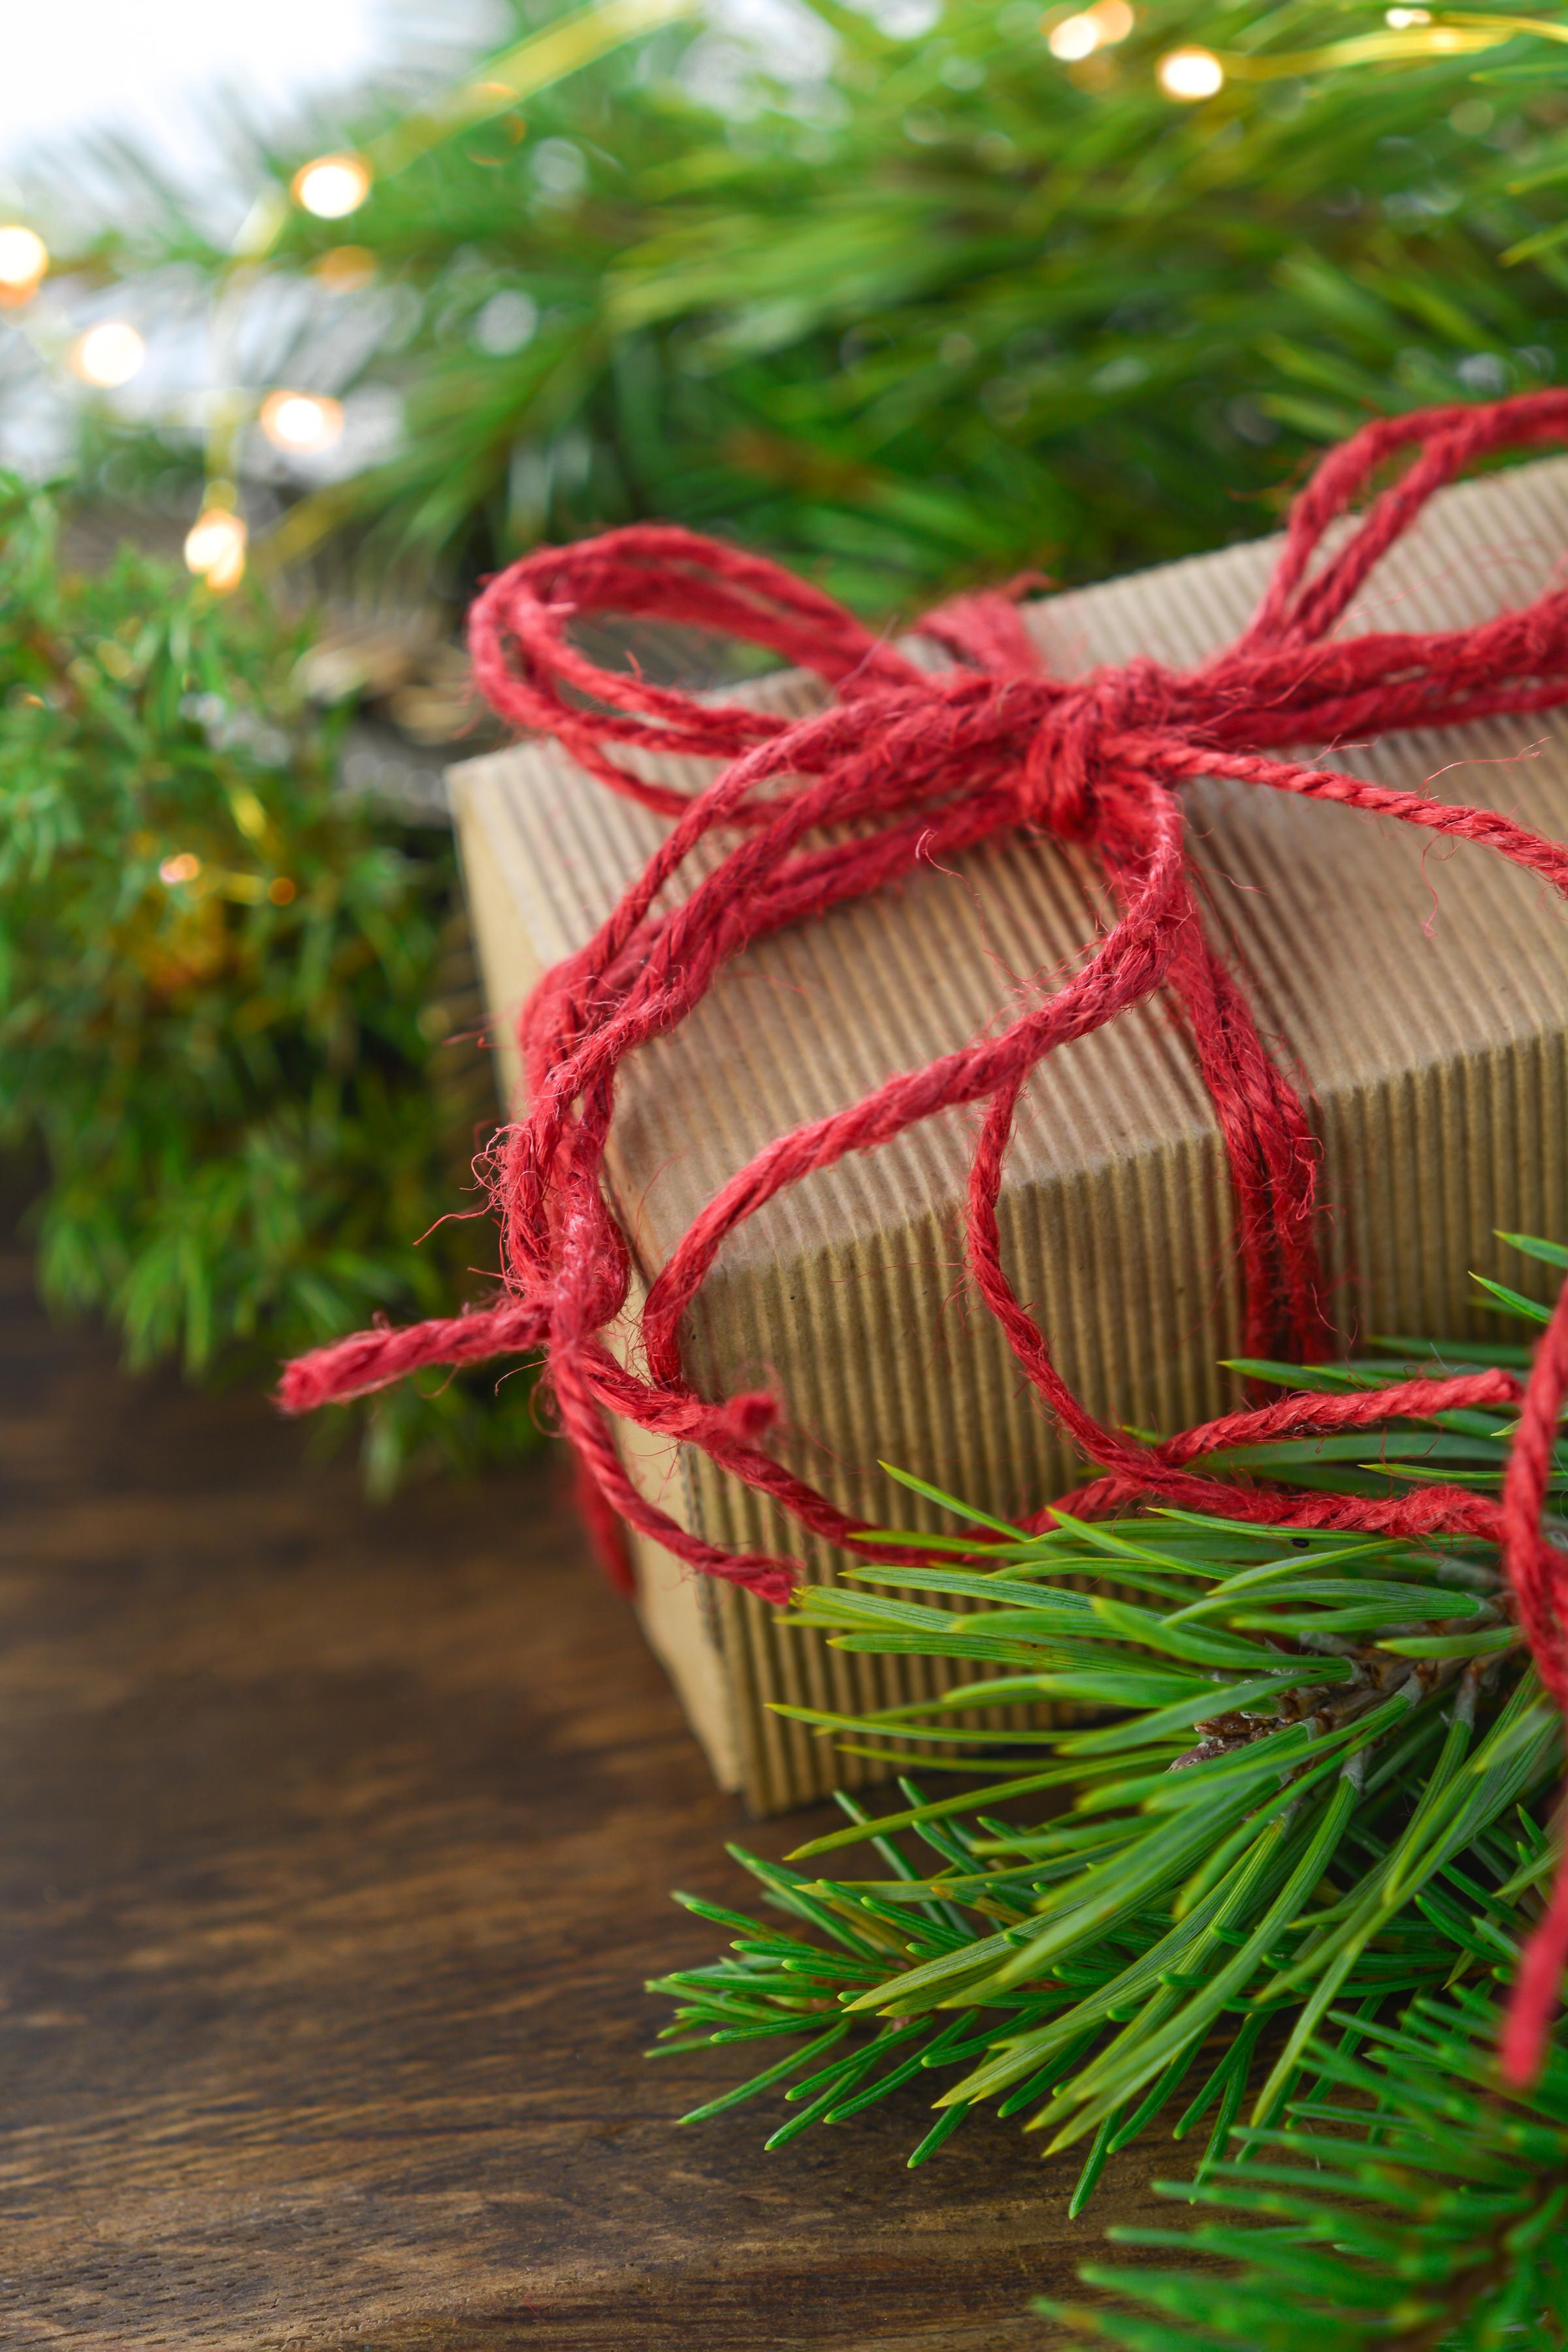 evergreen-holiday-christmas-fir-christmas-ornament-christmas-decoration-1418258-pxhere.com.jpg